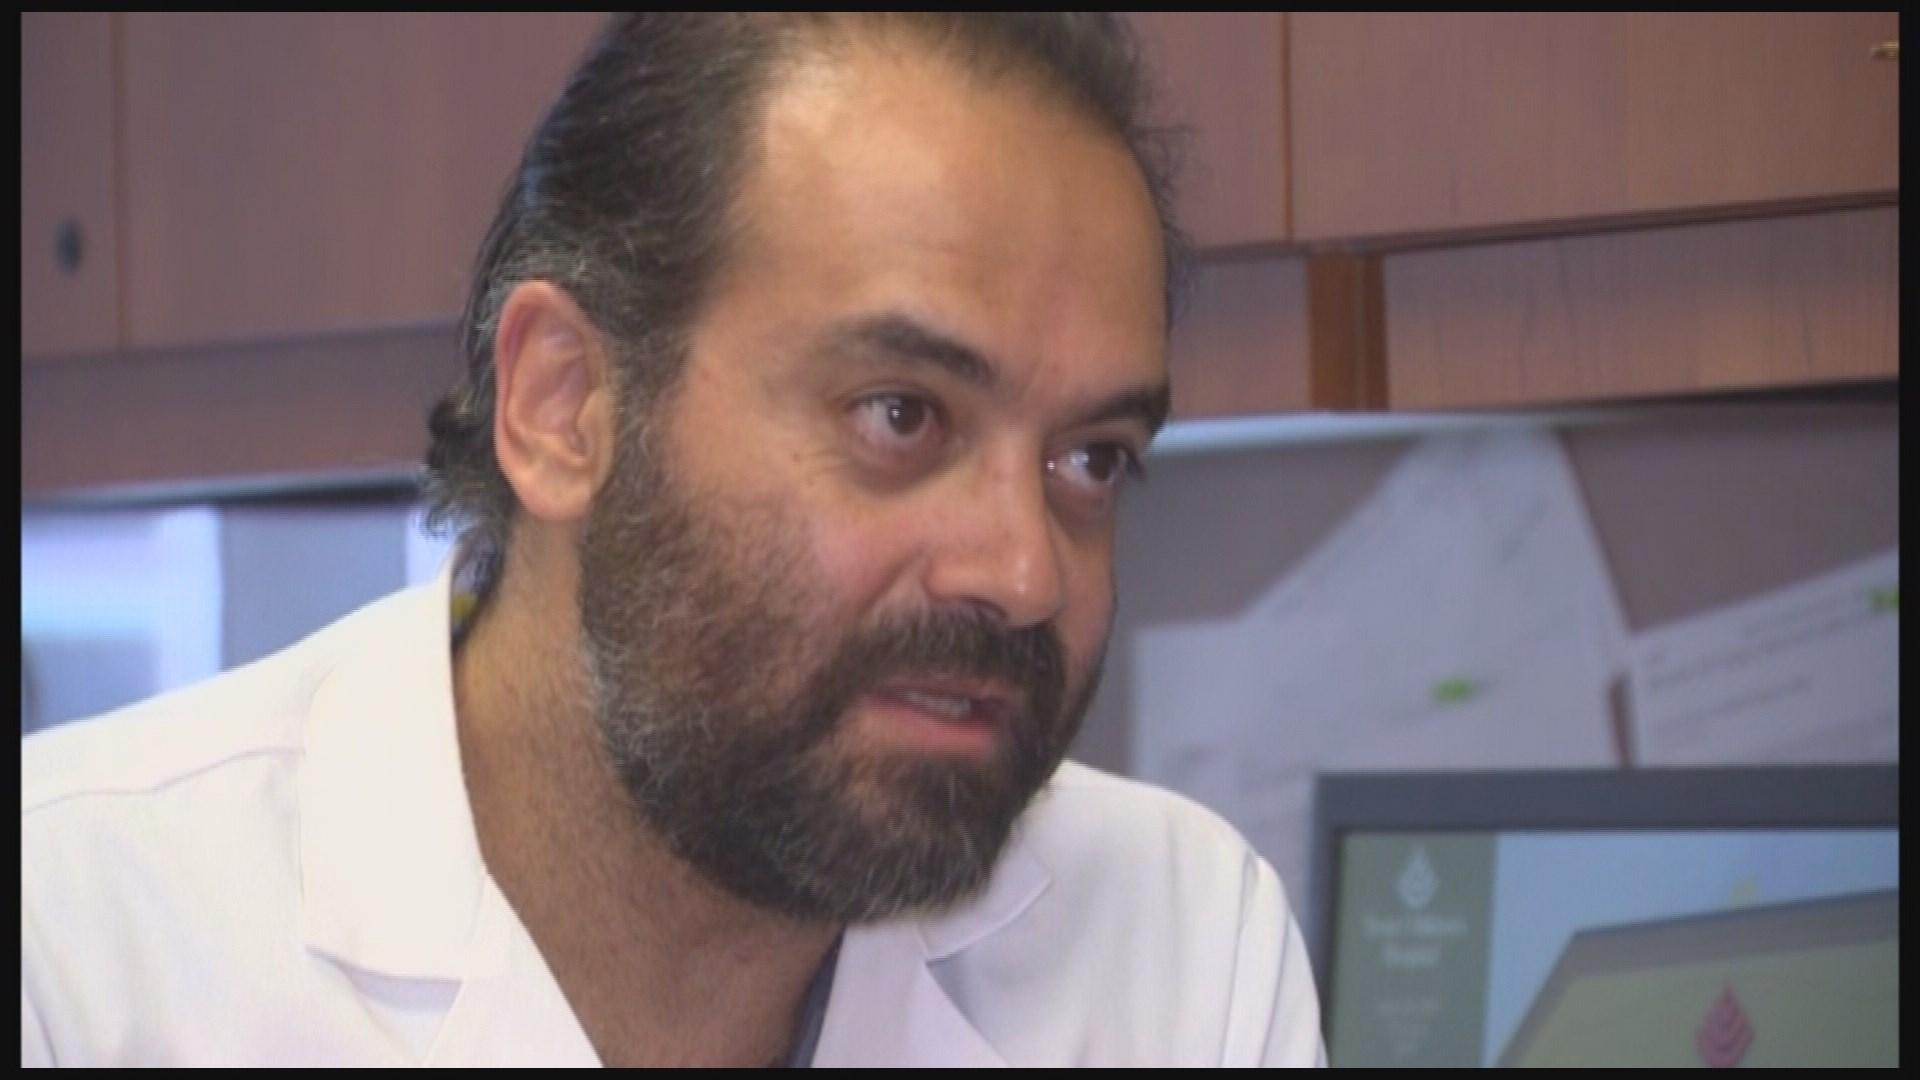 houston doctor resumes performing life saving surgeries in iran